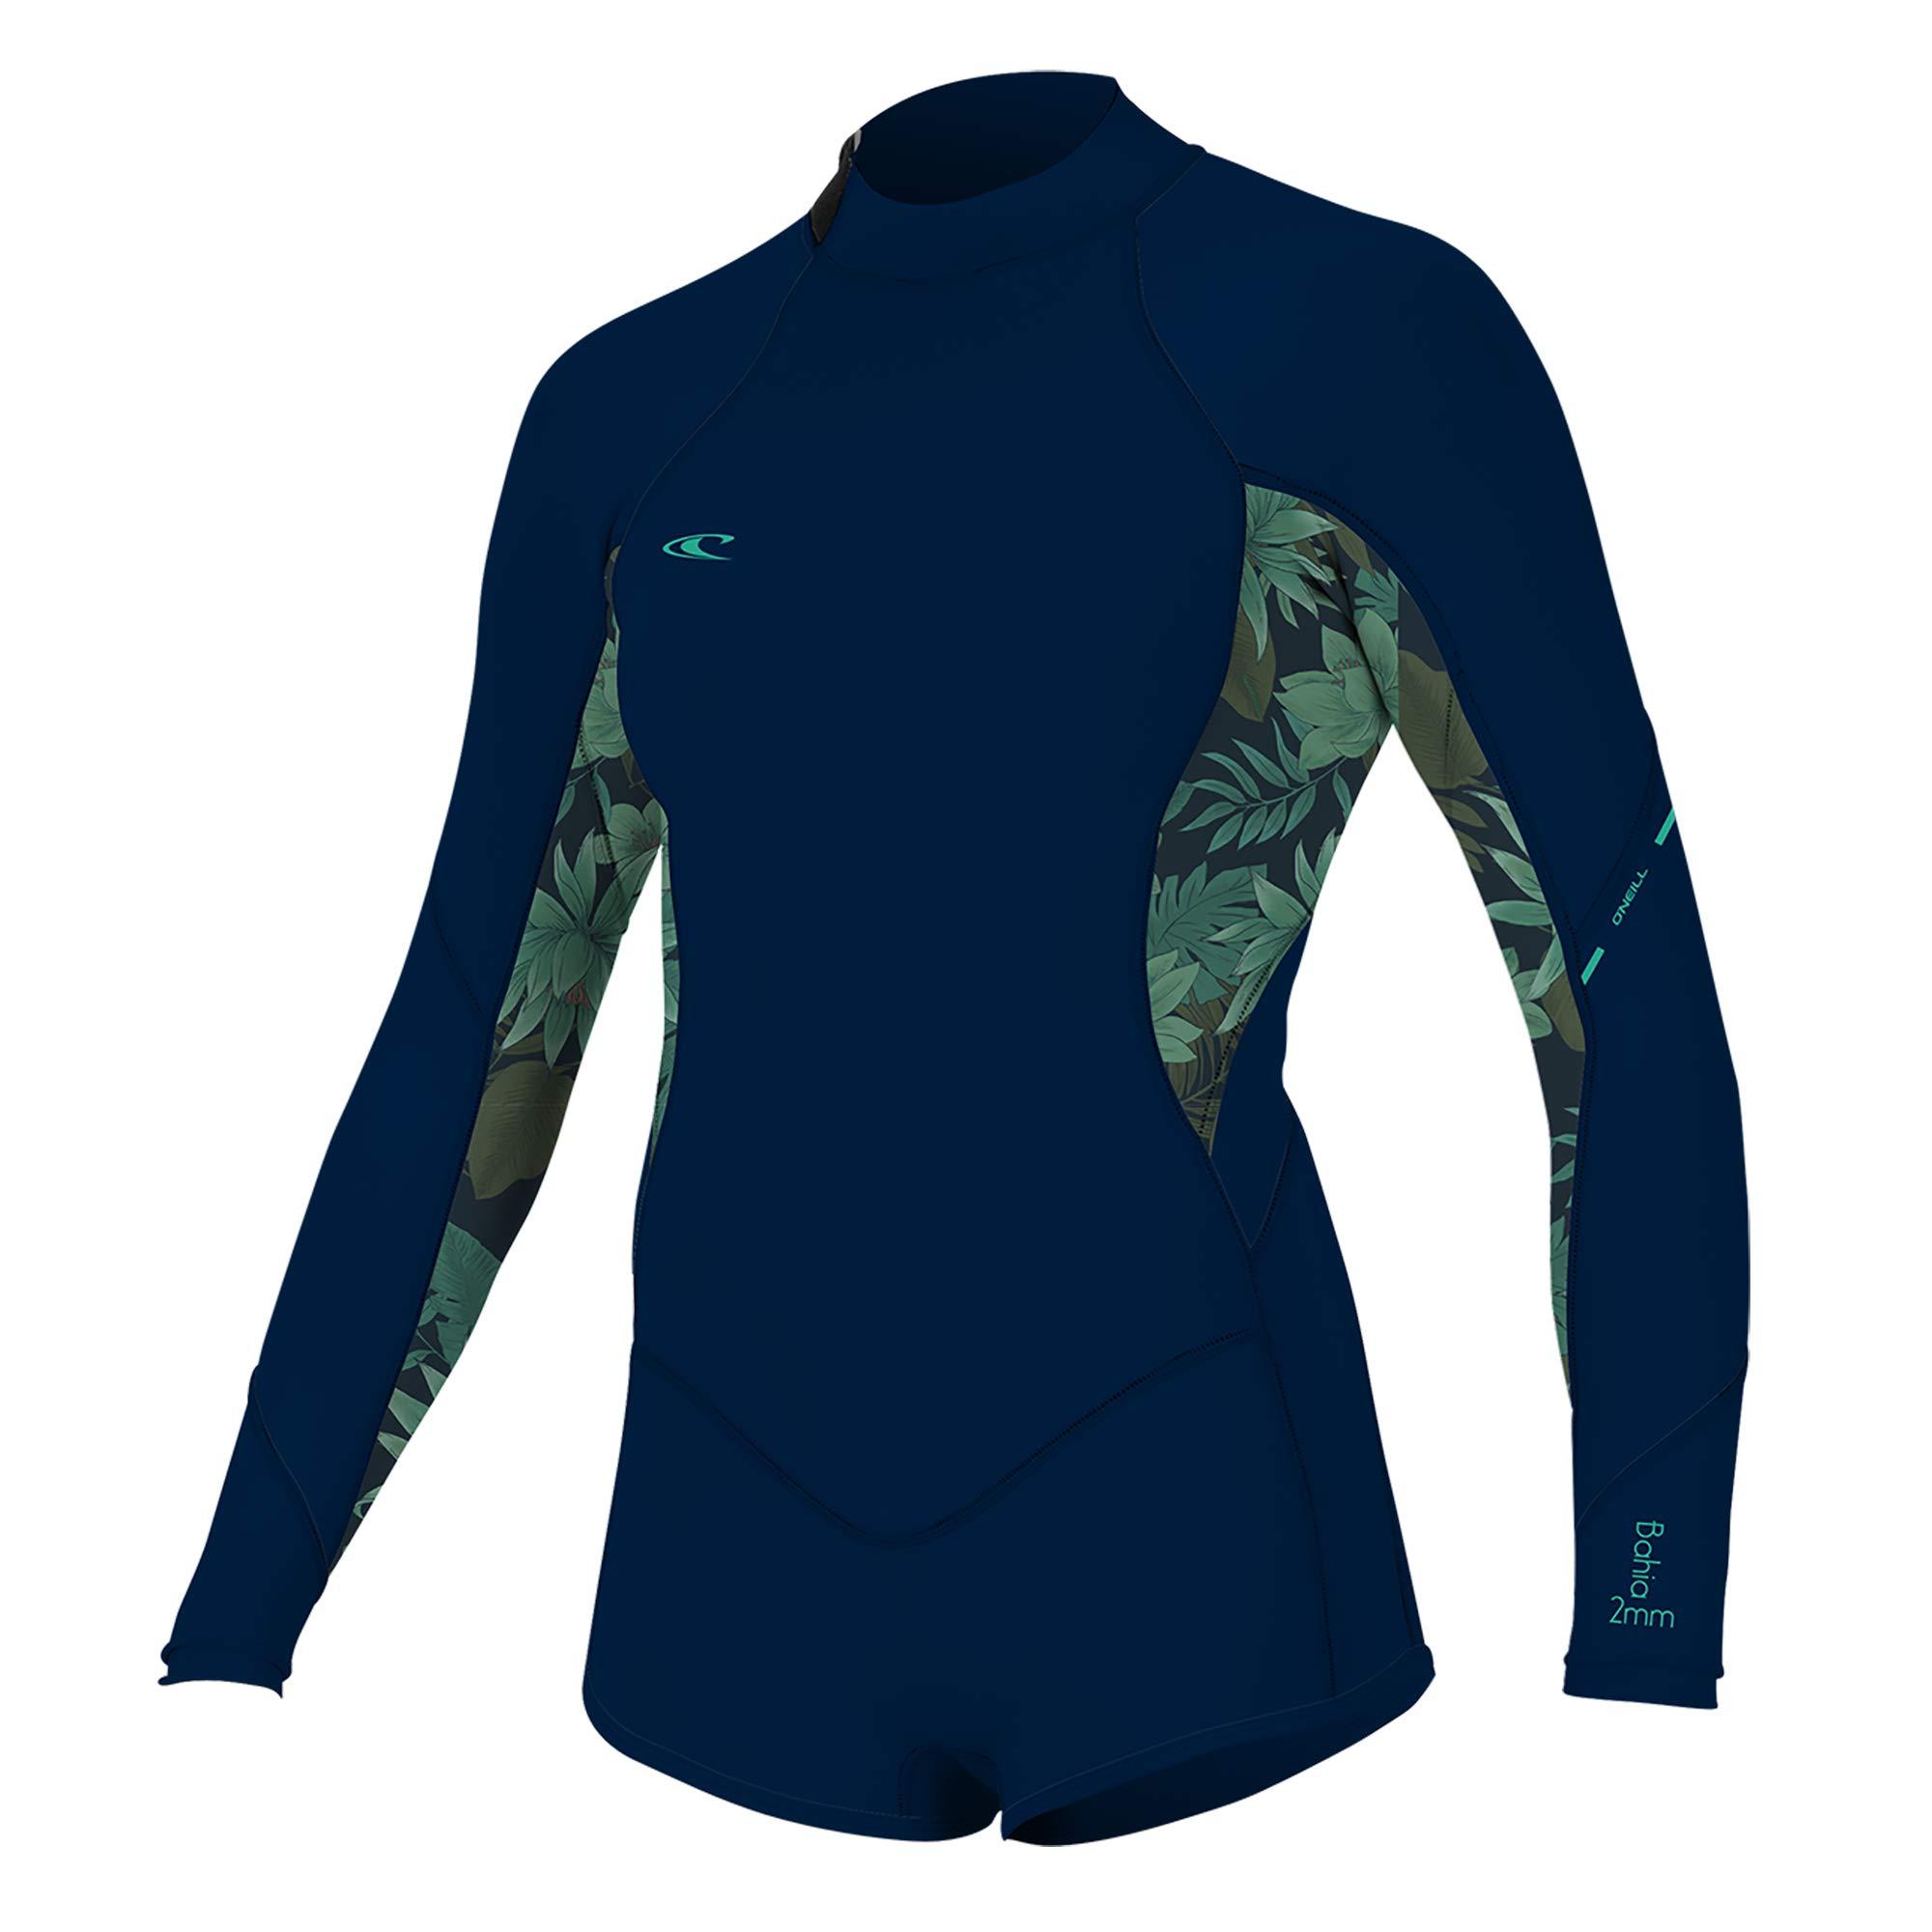 O'Neill Wetsuits Women's Bahia 2/1mm Back Zip Long Sleeve Short Spring, Abyss/Faro, 4